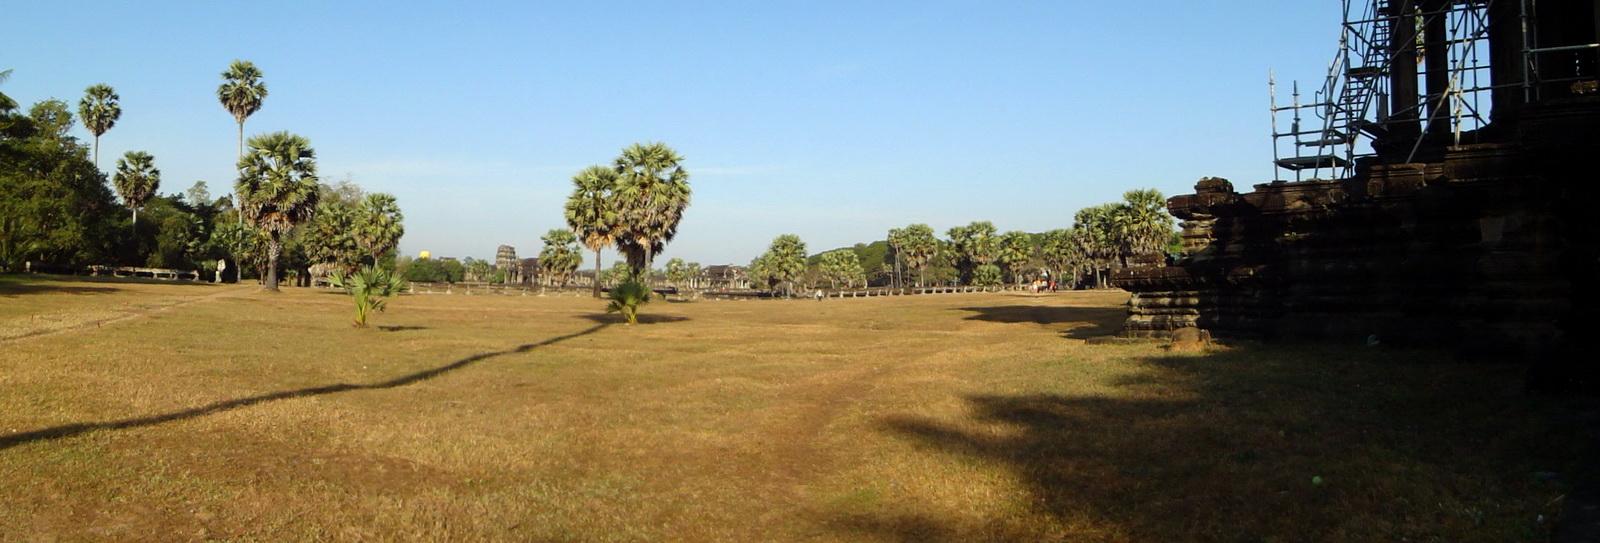 Angkor Wat panoramic view S side looking west Angkor Siem Reap 02